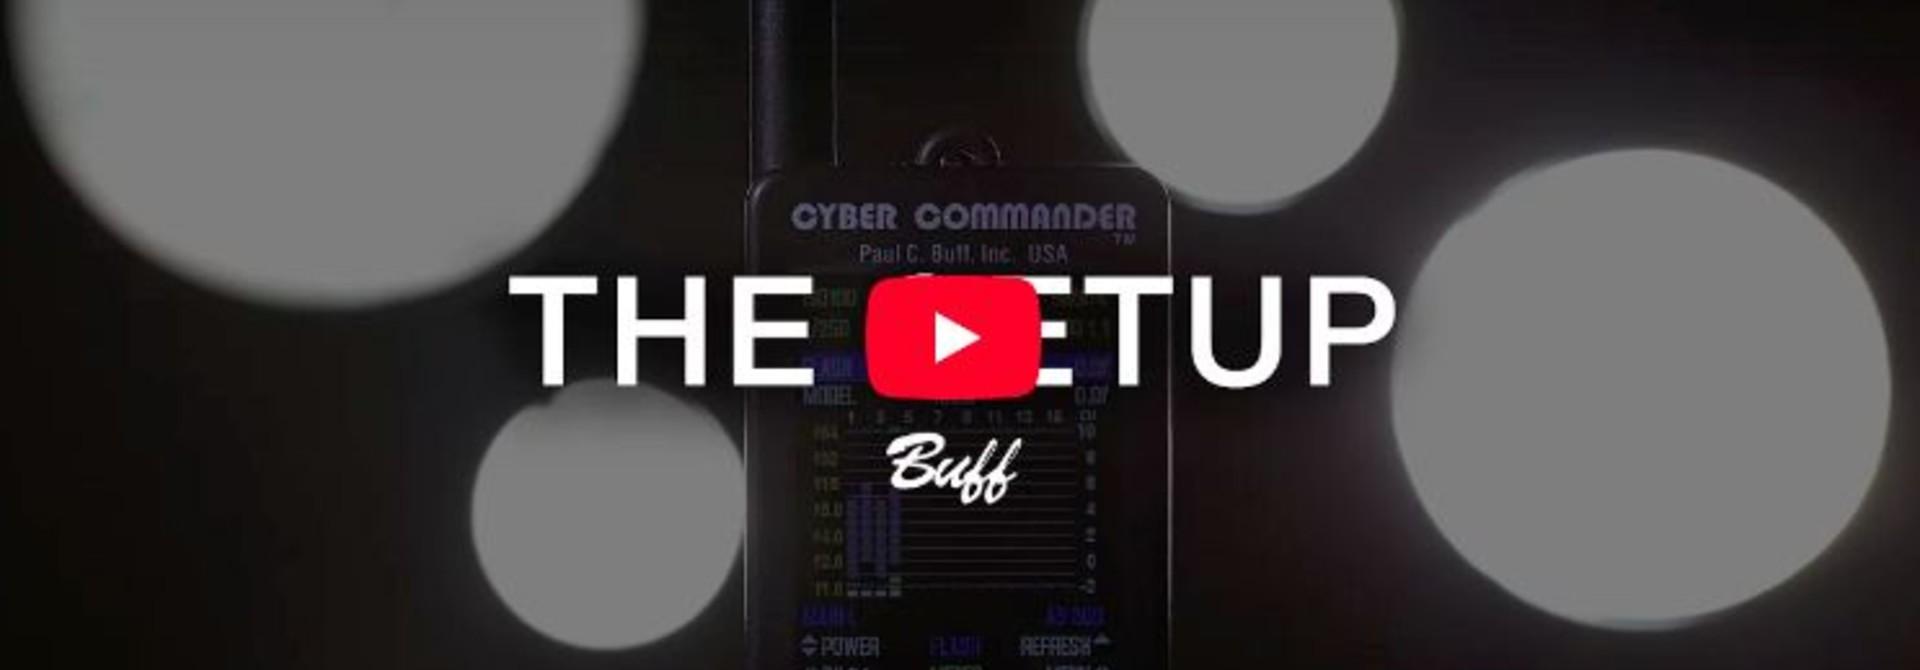 Cyber Commander – Video 1 - Setup